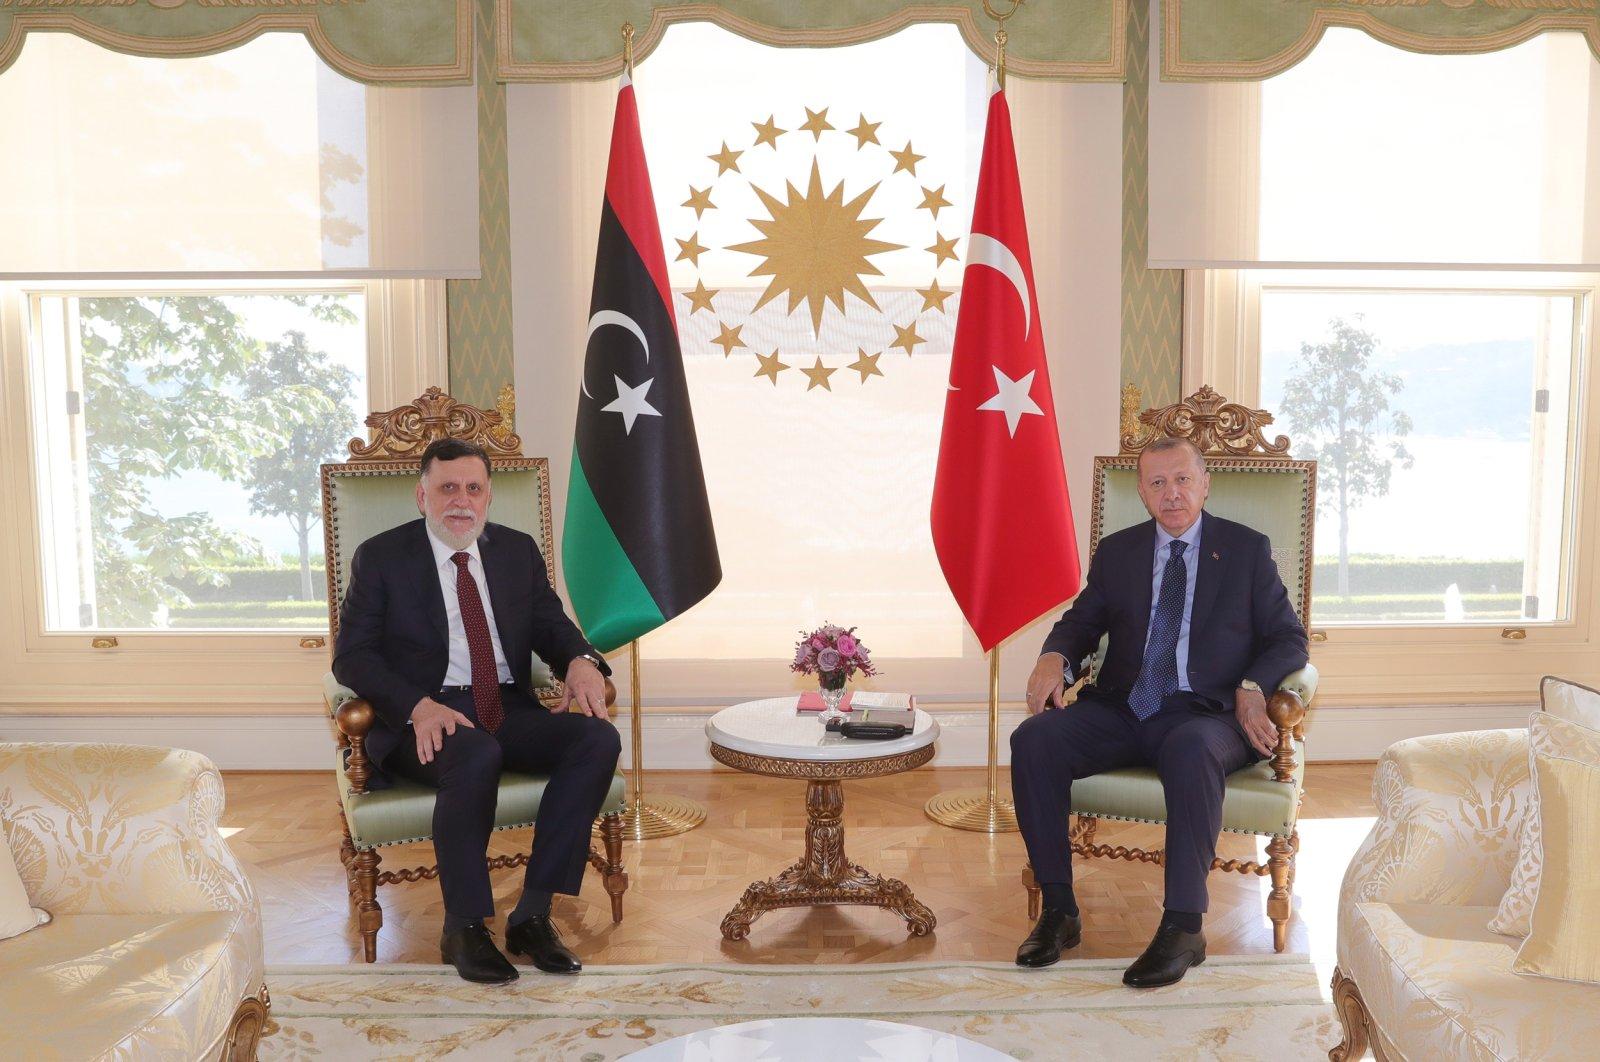 President Recep Tayyip Erdoğan meets with Libya's Prime Minister Fayez al-Sarraj in Istanbul's Vahdettin Palace, July 25, 2020. (DHA Photo)